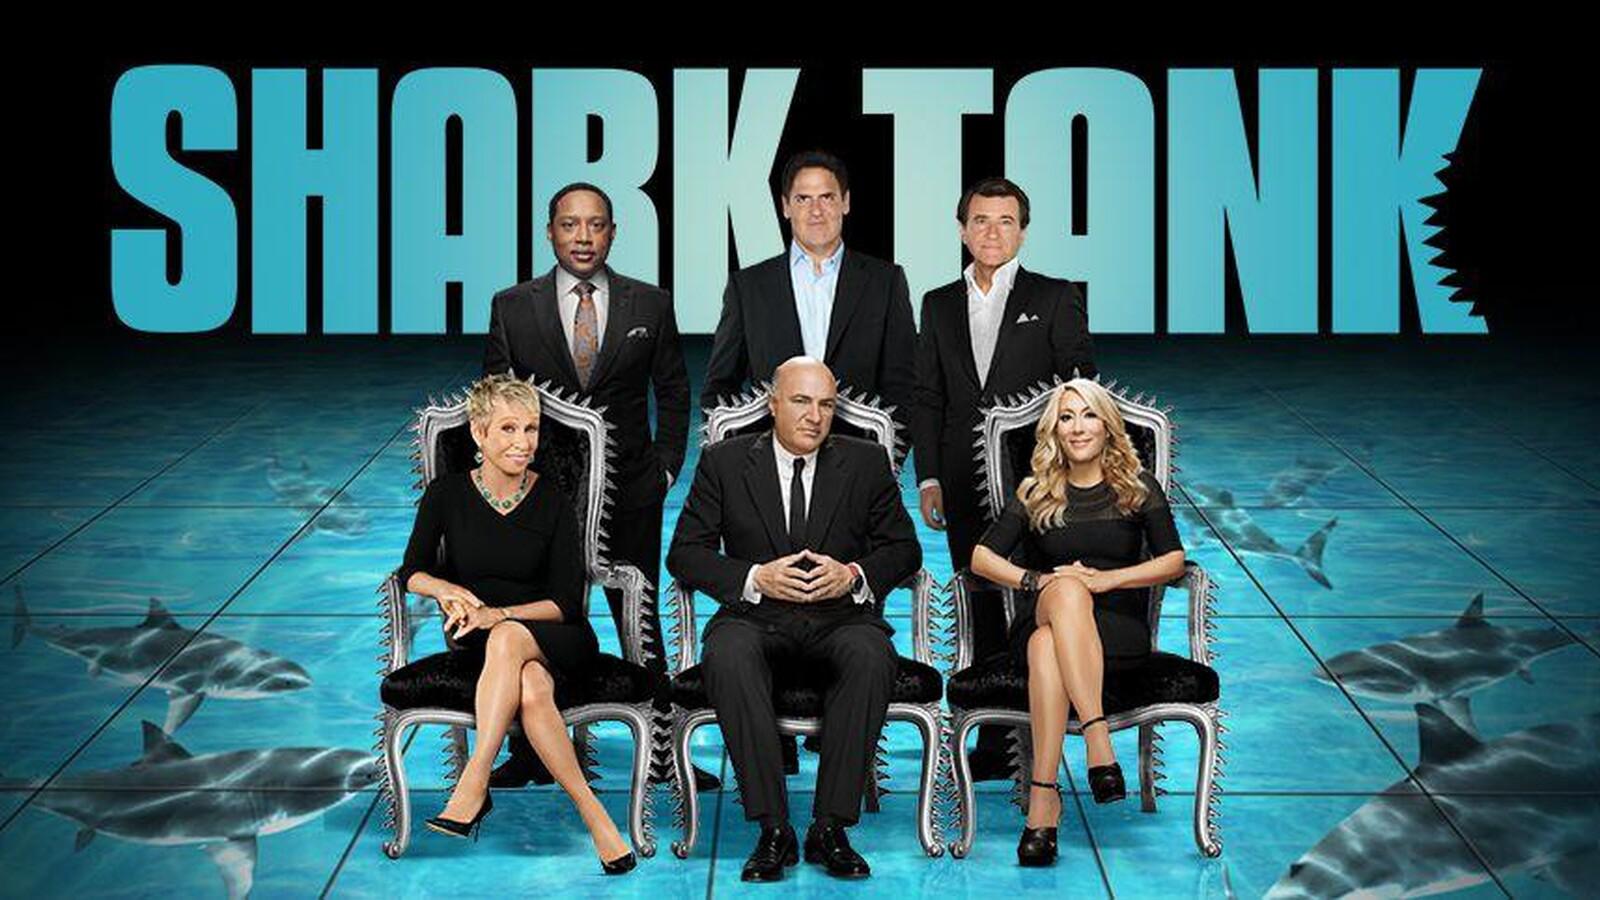 ABC's Shark Tank Dives Into Season 11 with Four Brand-New Guest Sharks | Shark Tank